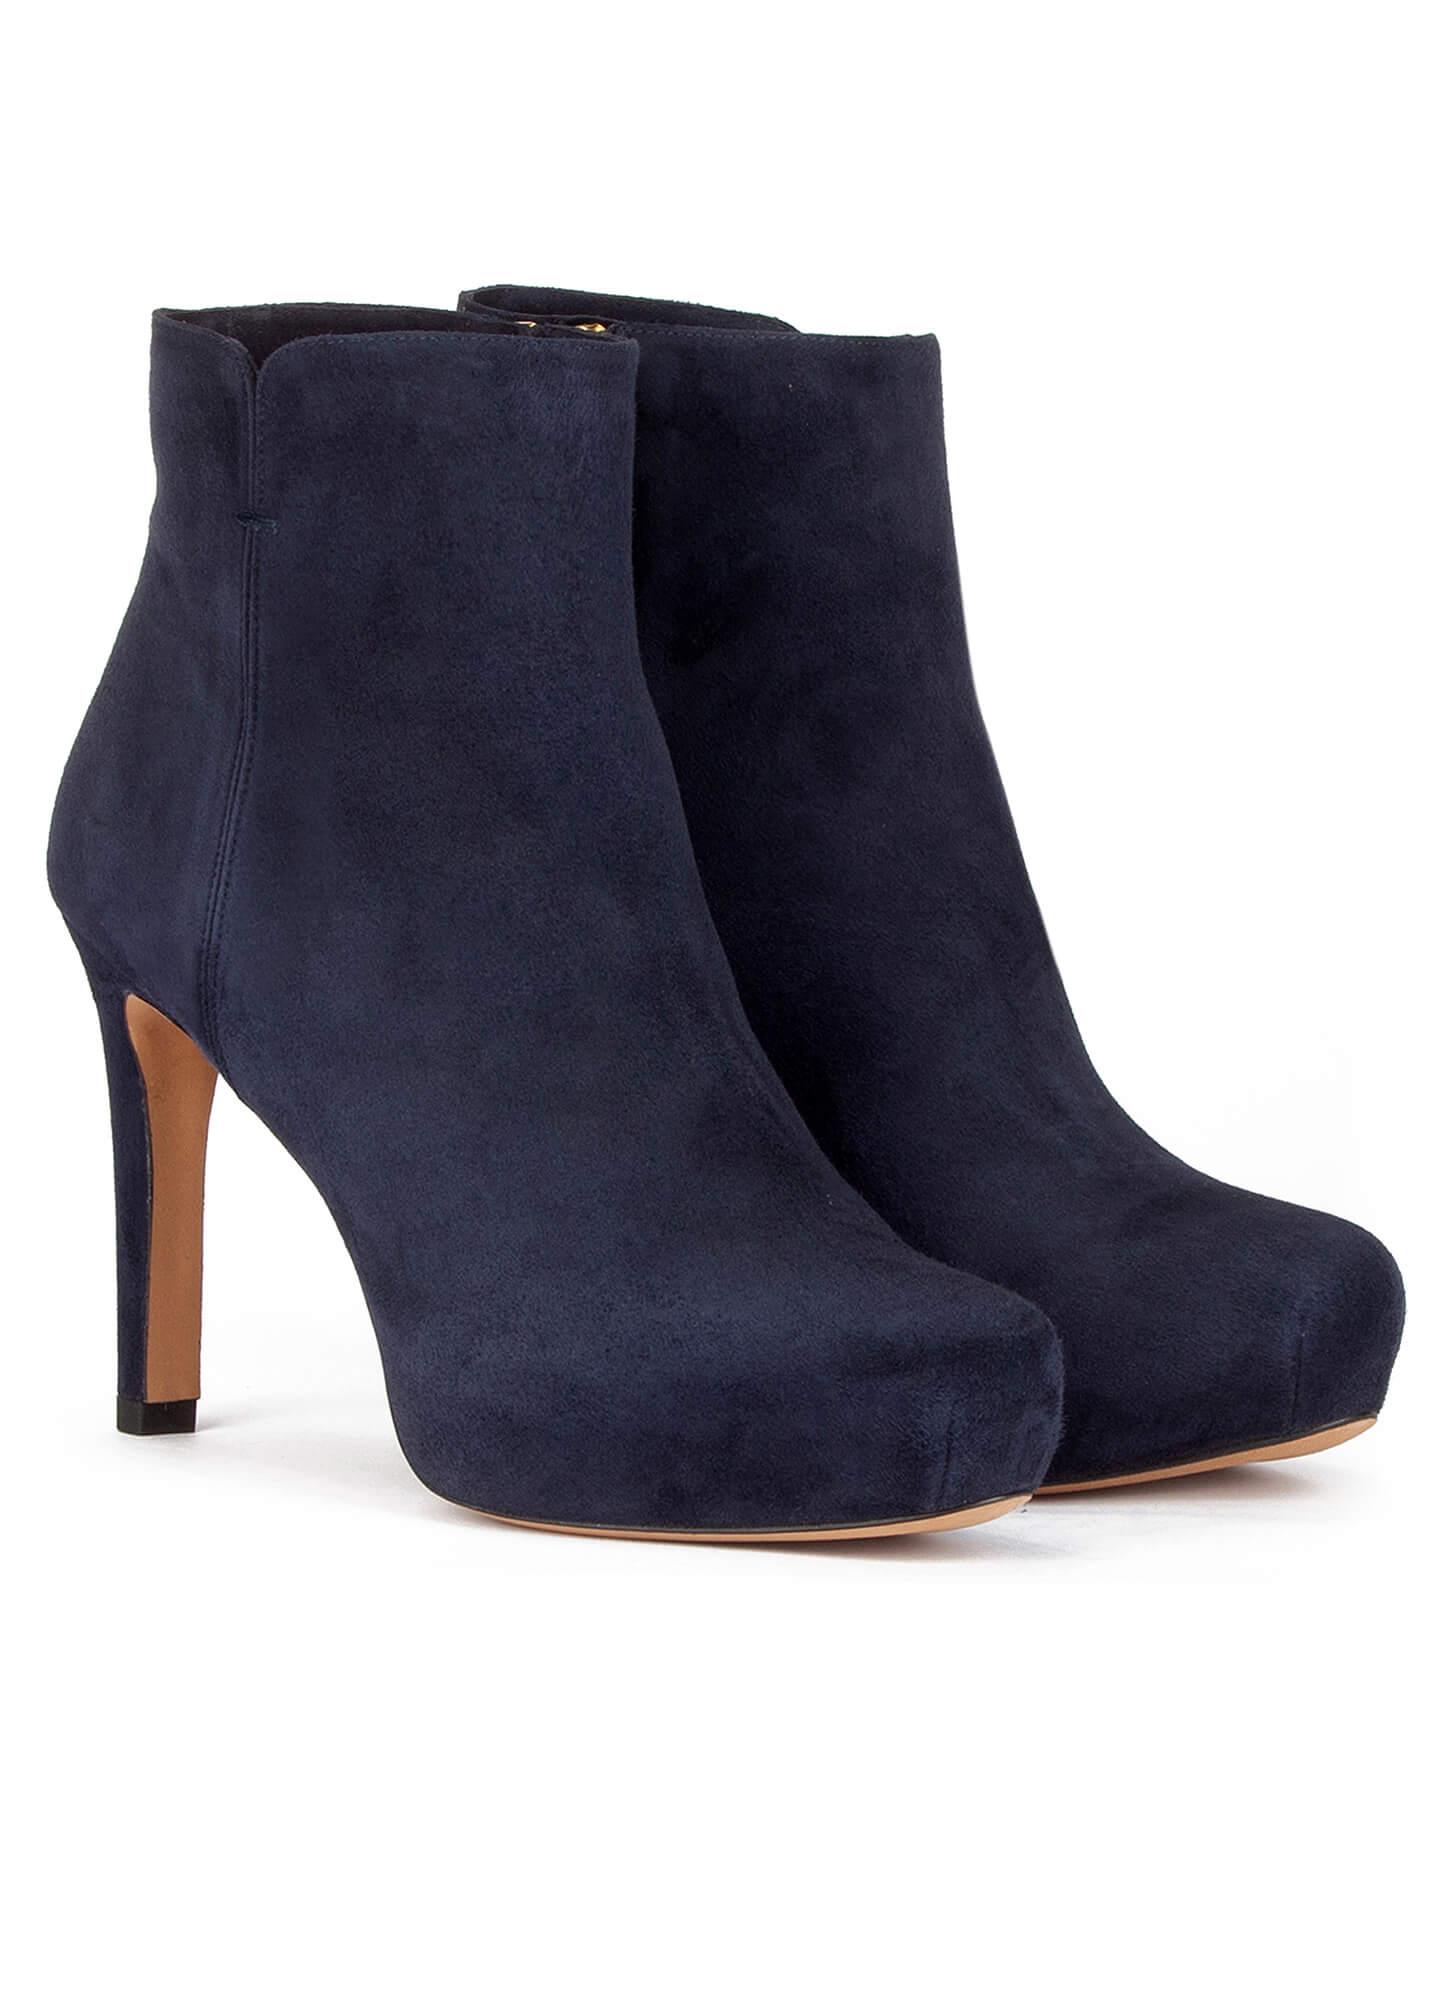 Platform Blau Leather Damen Stiefel Navy rdQshCt